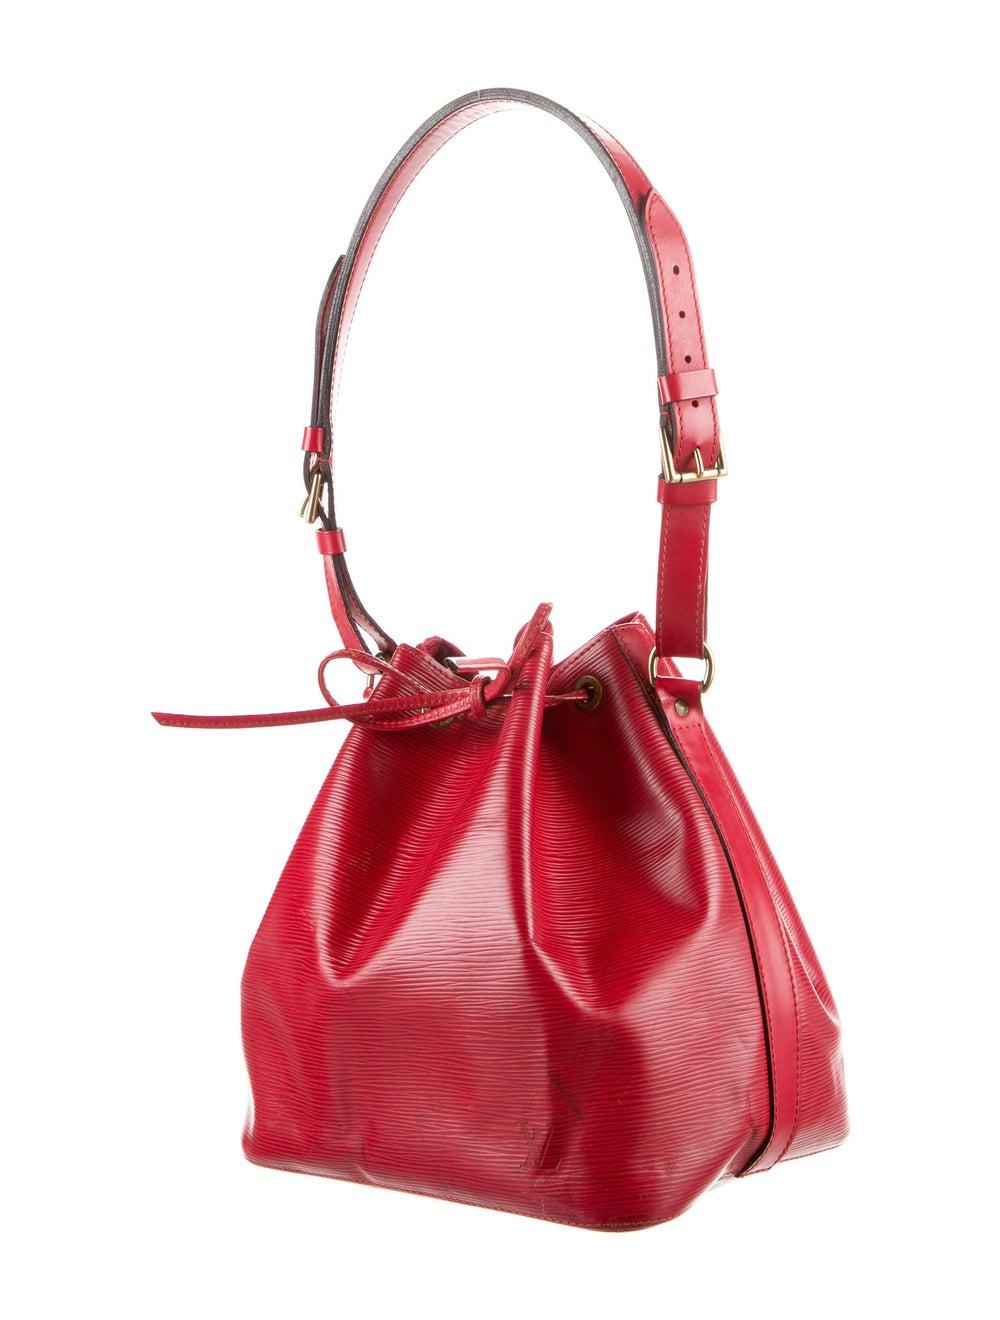 Louis Vuitton Vintage Epi Petit Noe Red - image 3